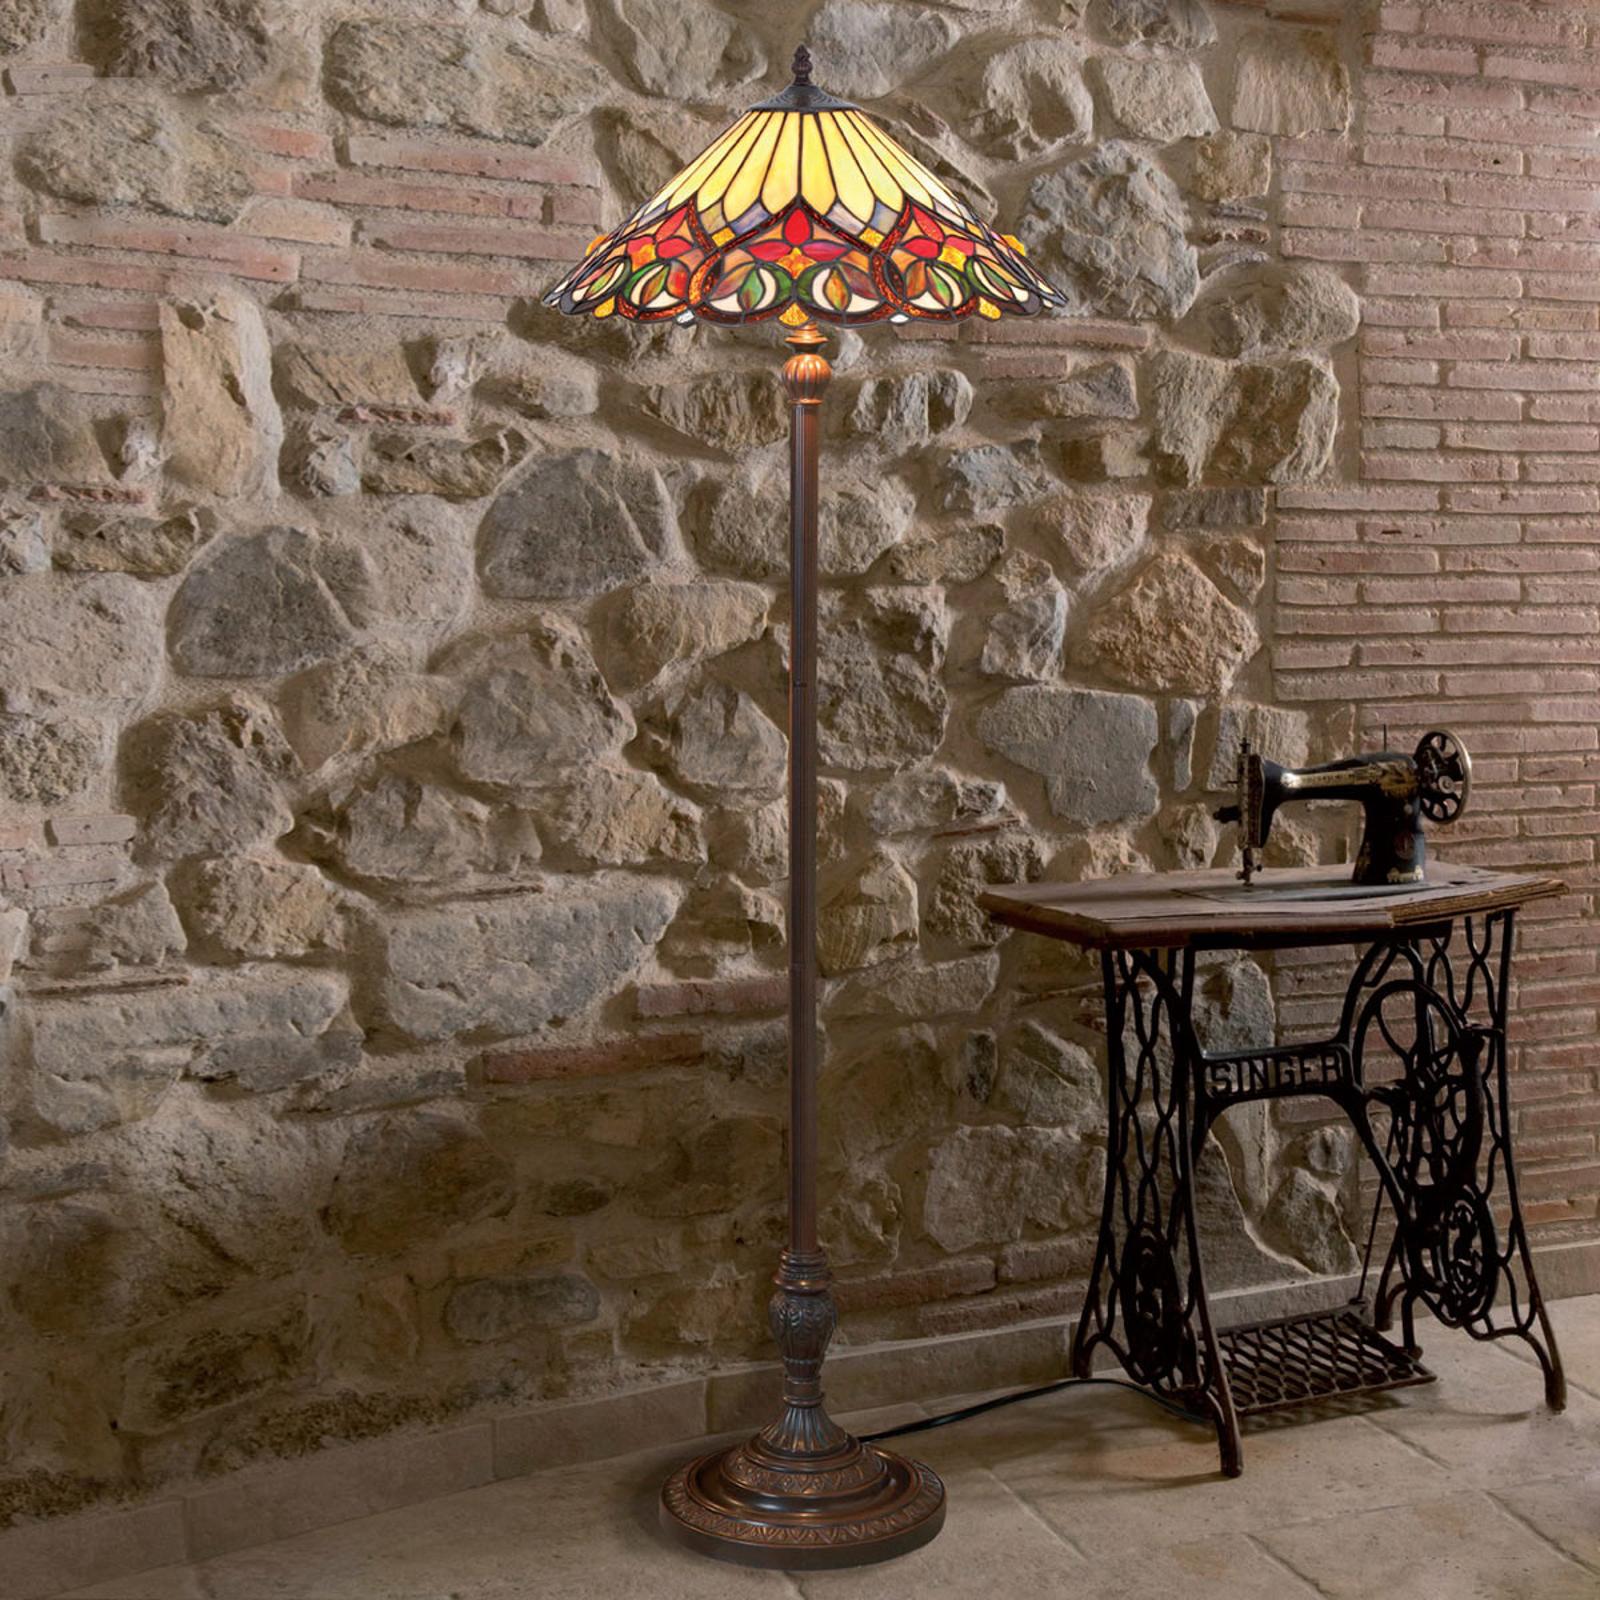 Stojaca lampa Anni v štýle Tiffany_1032334_1